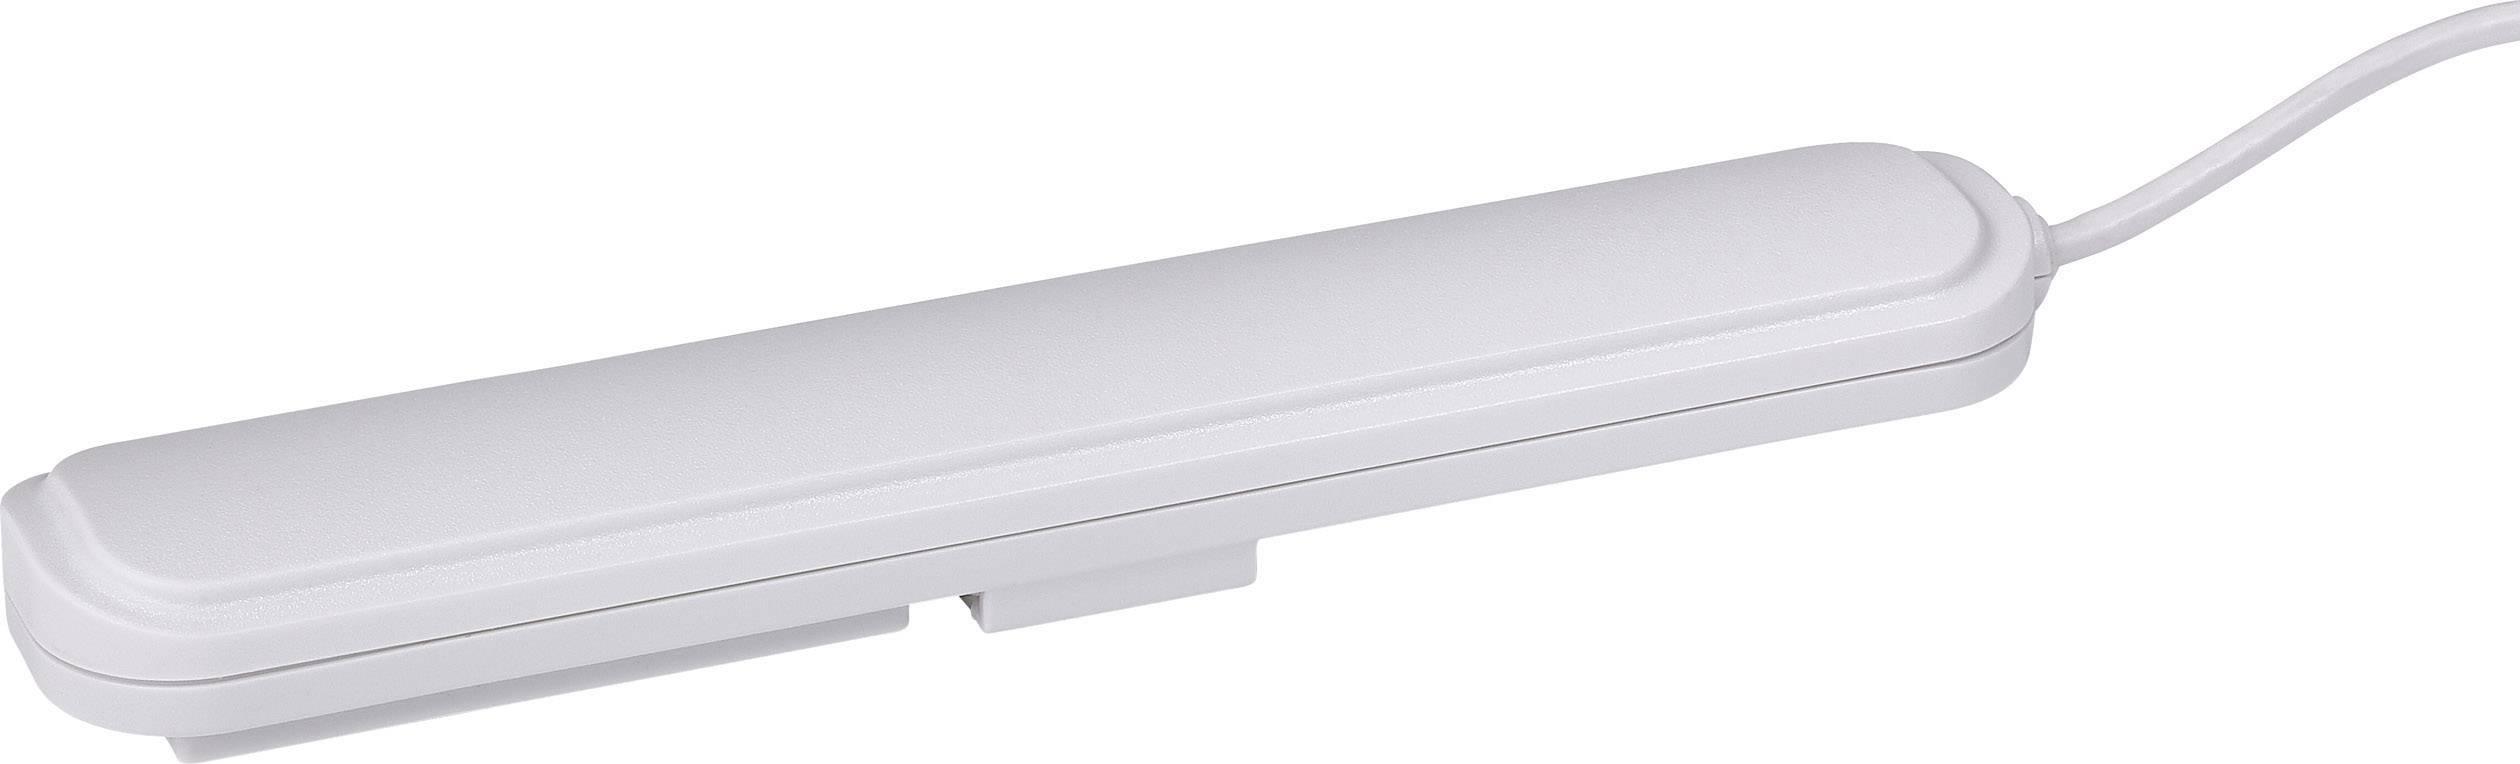 Aktivní plochá DVB-T/T2 anténa Renkforce DA-7361, vnitřní, 13 dB, bílá